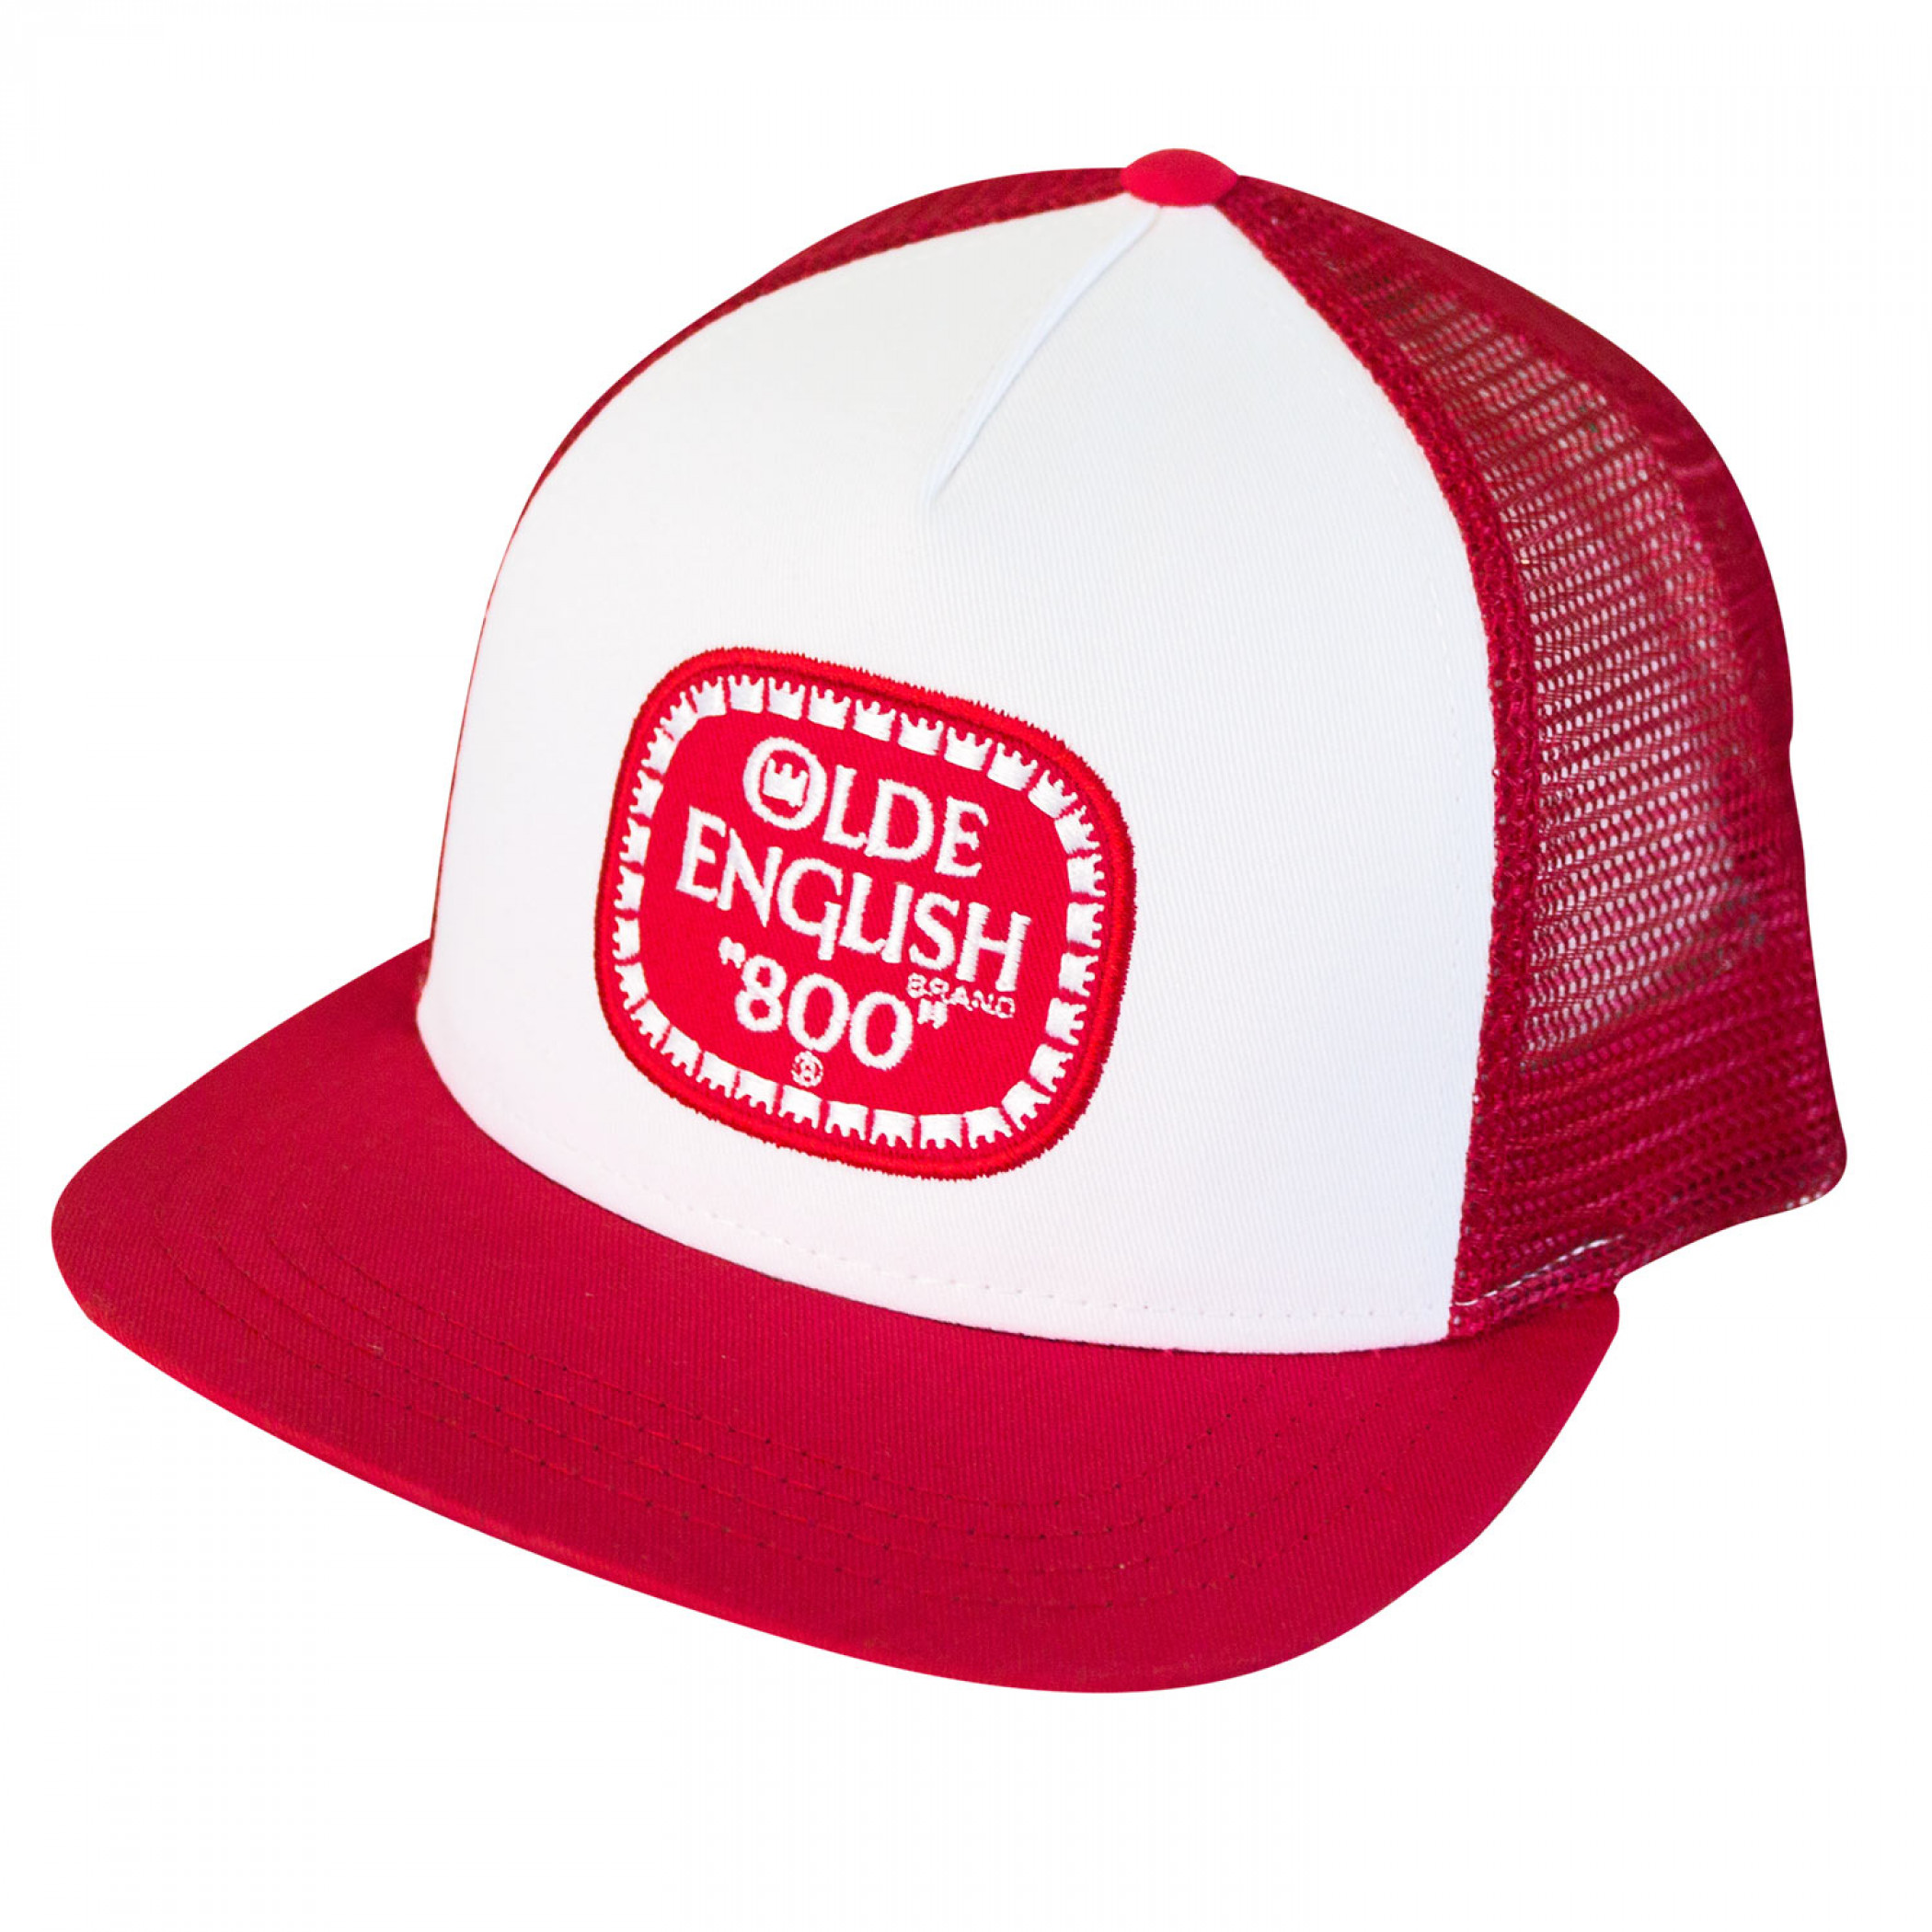 Olde English 800 Logo Trucker Hat